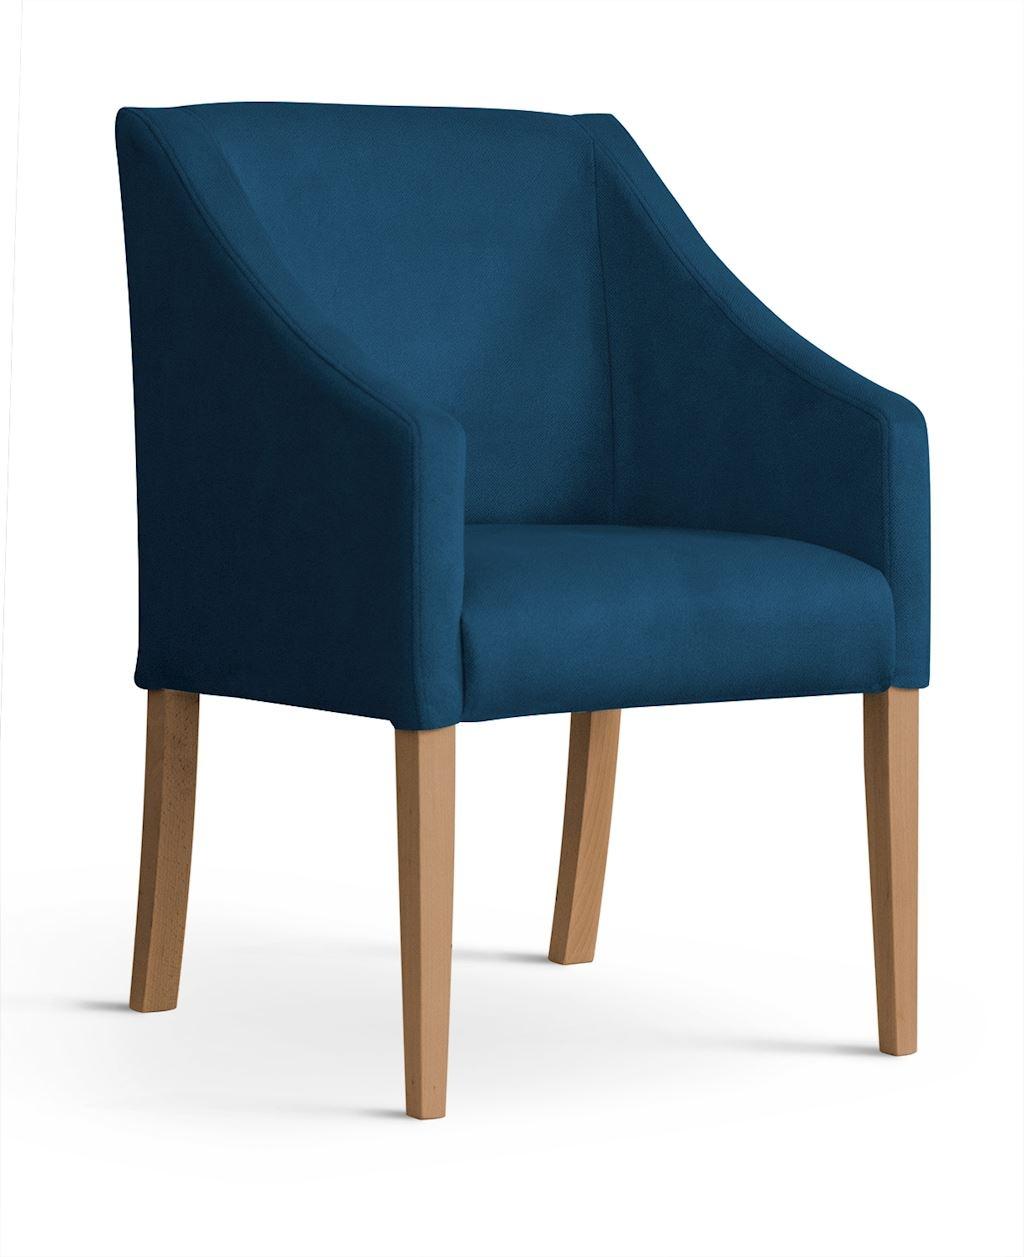 Fotoliu fix tapitat cu stofa cu picioare din lemn Capri Navy Blue / Oak l58xA60xH89 cm